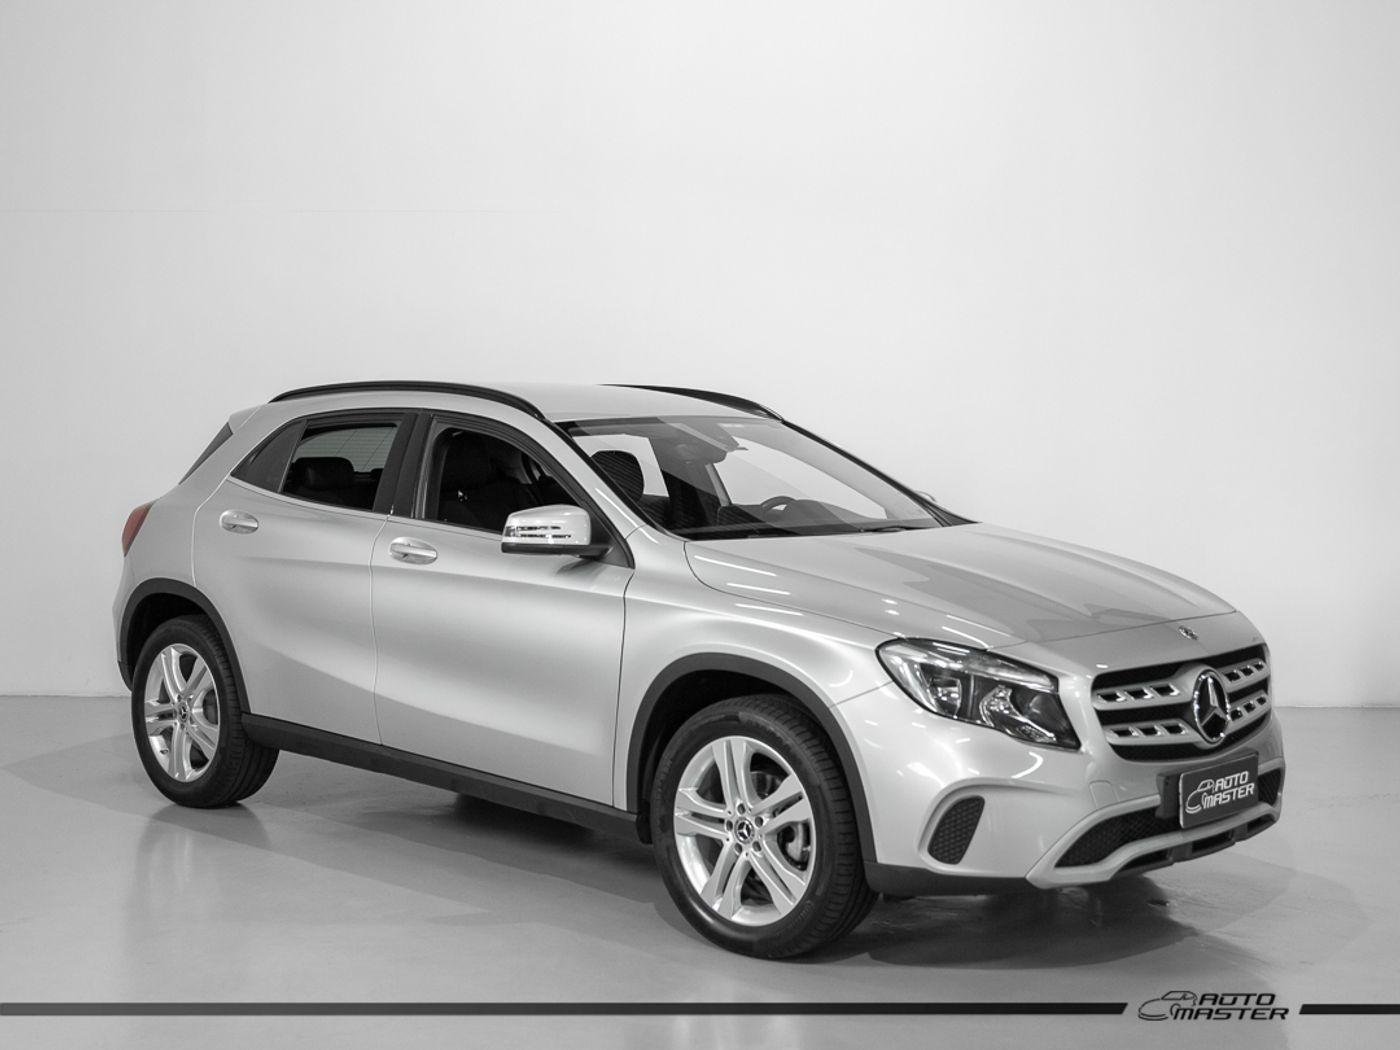 Mercedes GLA 200 Style 1.6 TB 16V/Flex Aut.